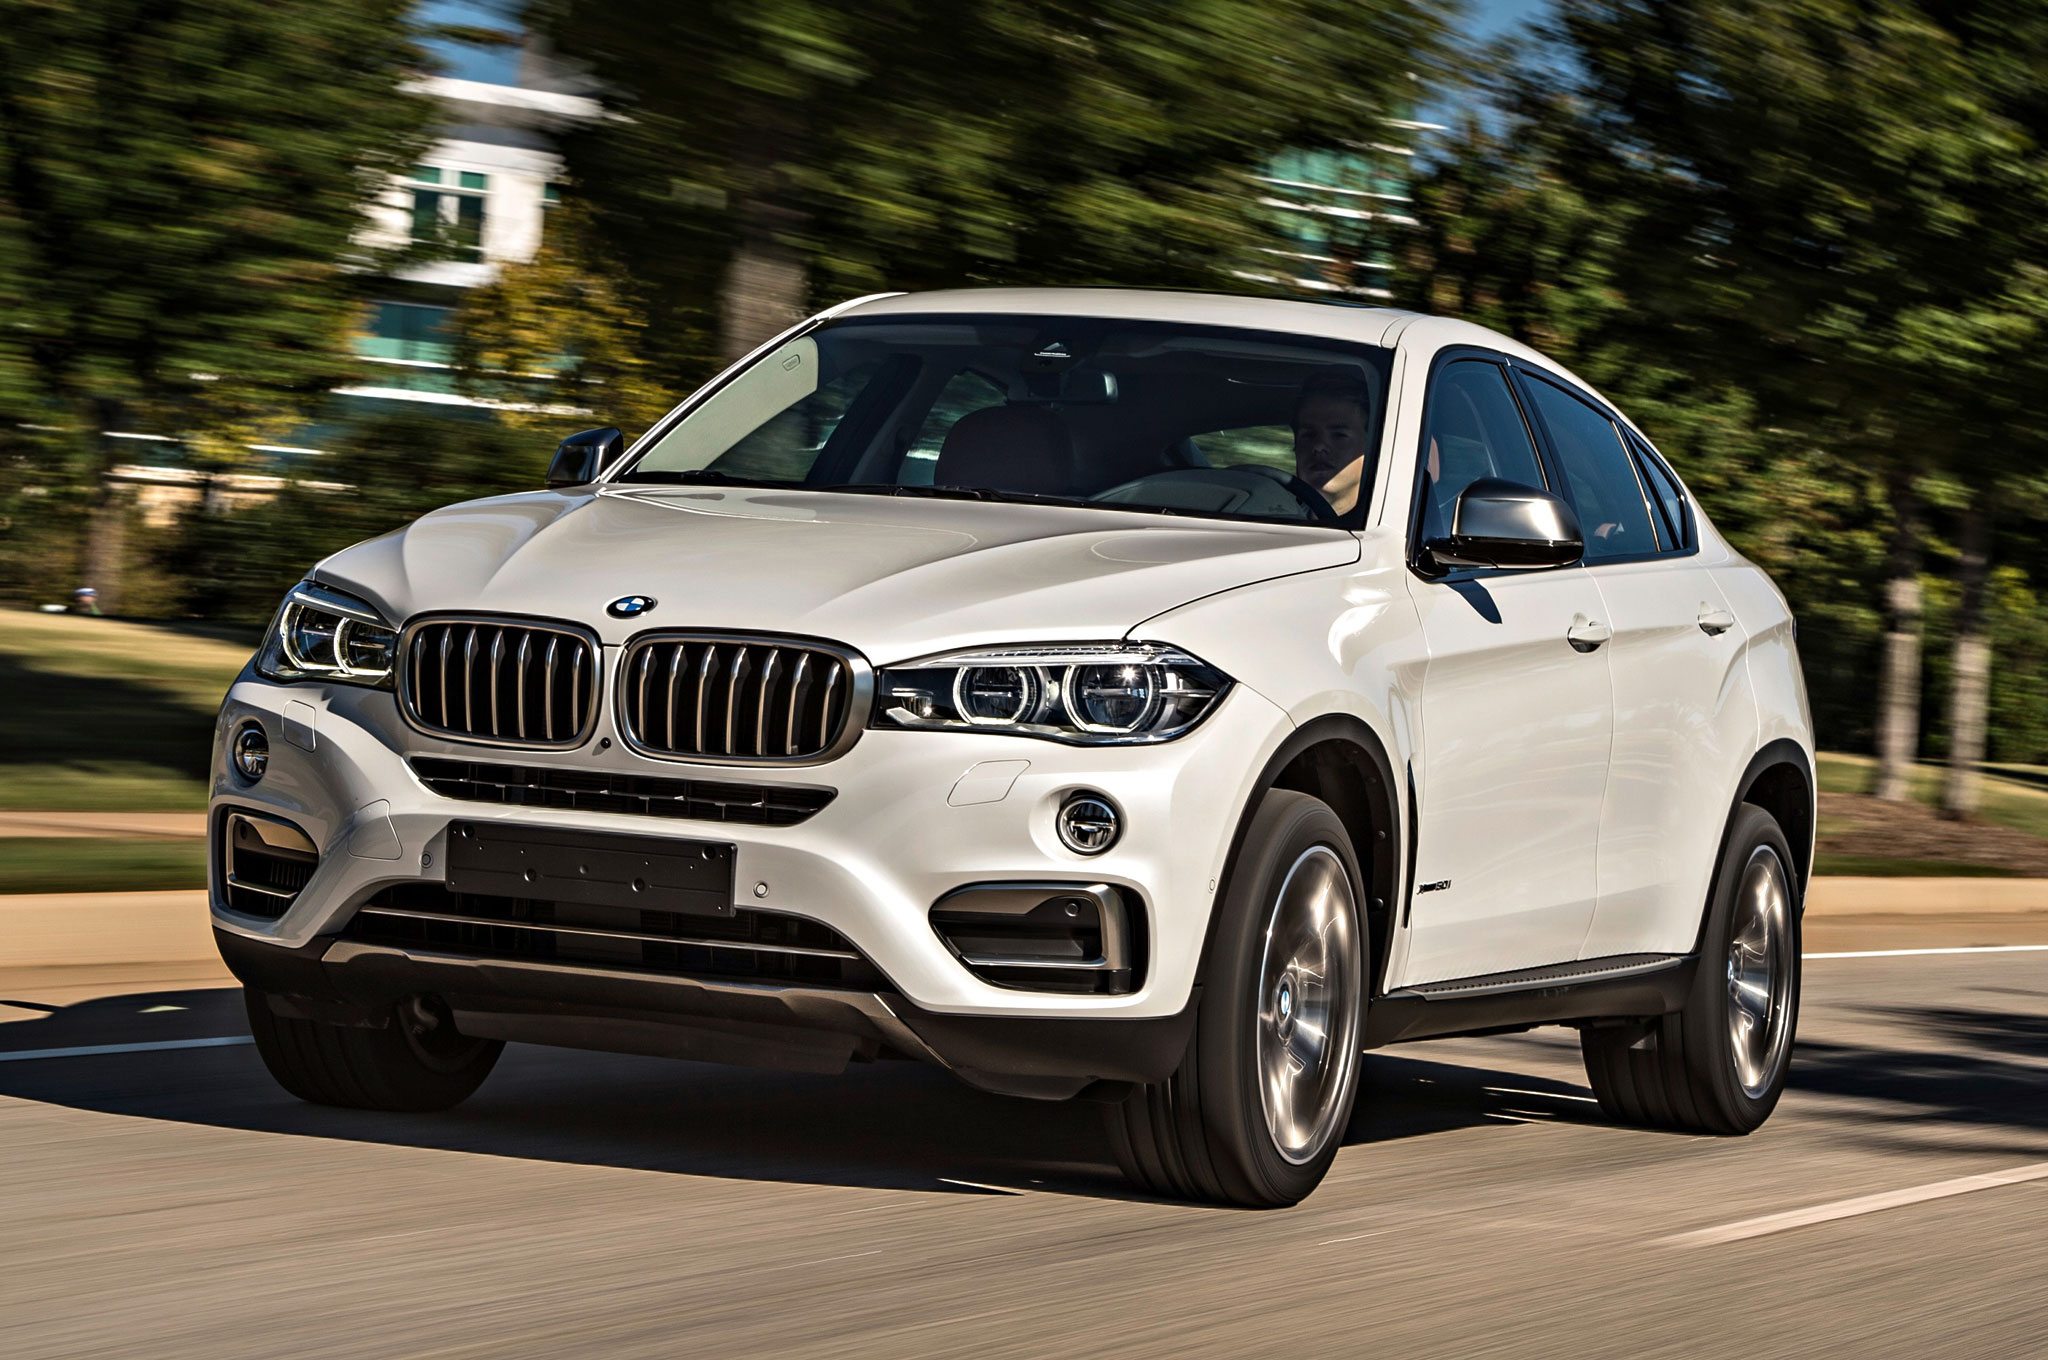 2018 Jeep Grand Cherokee >> صور BMW X6 خلفيات و رمزيات بي ام دبليو اكس 6 | ميكساتك